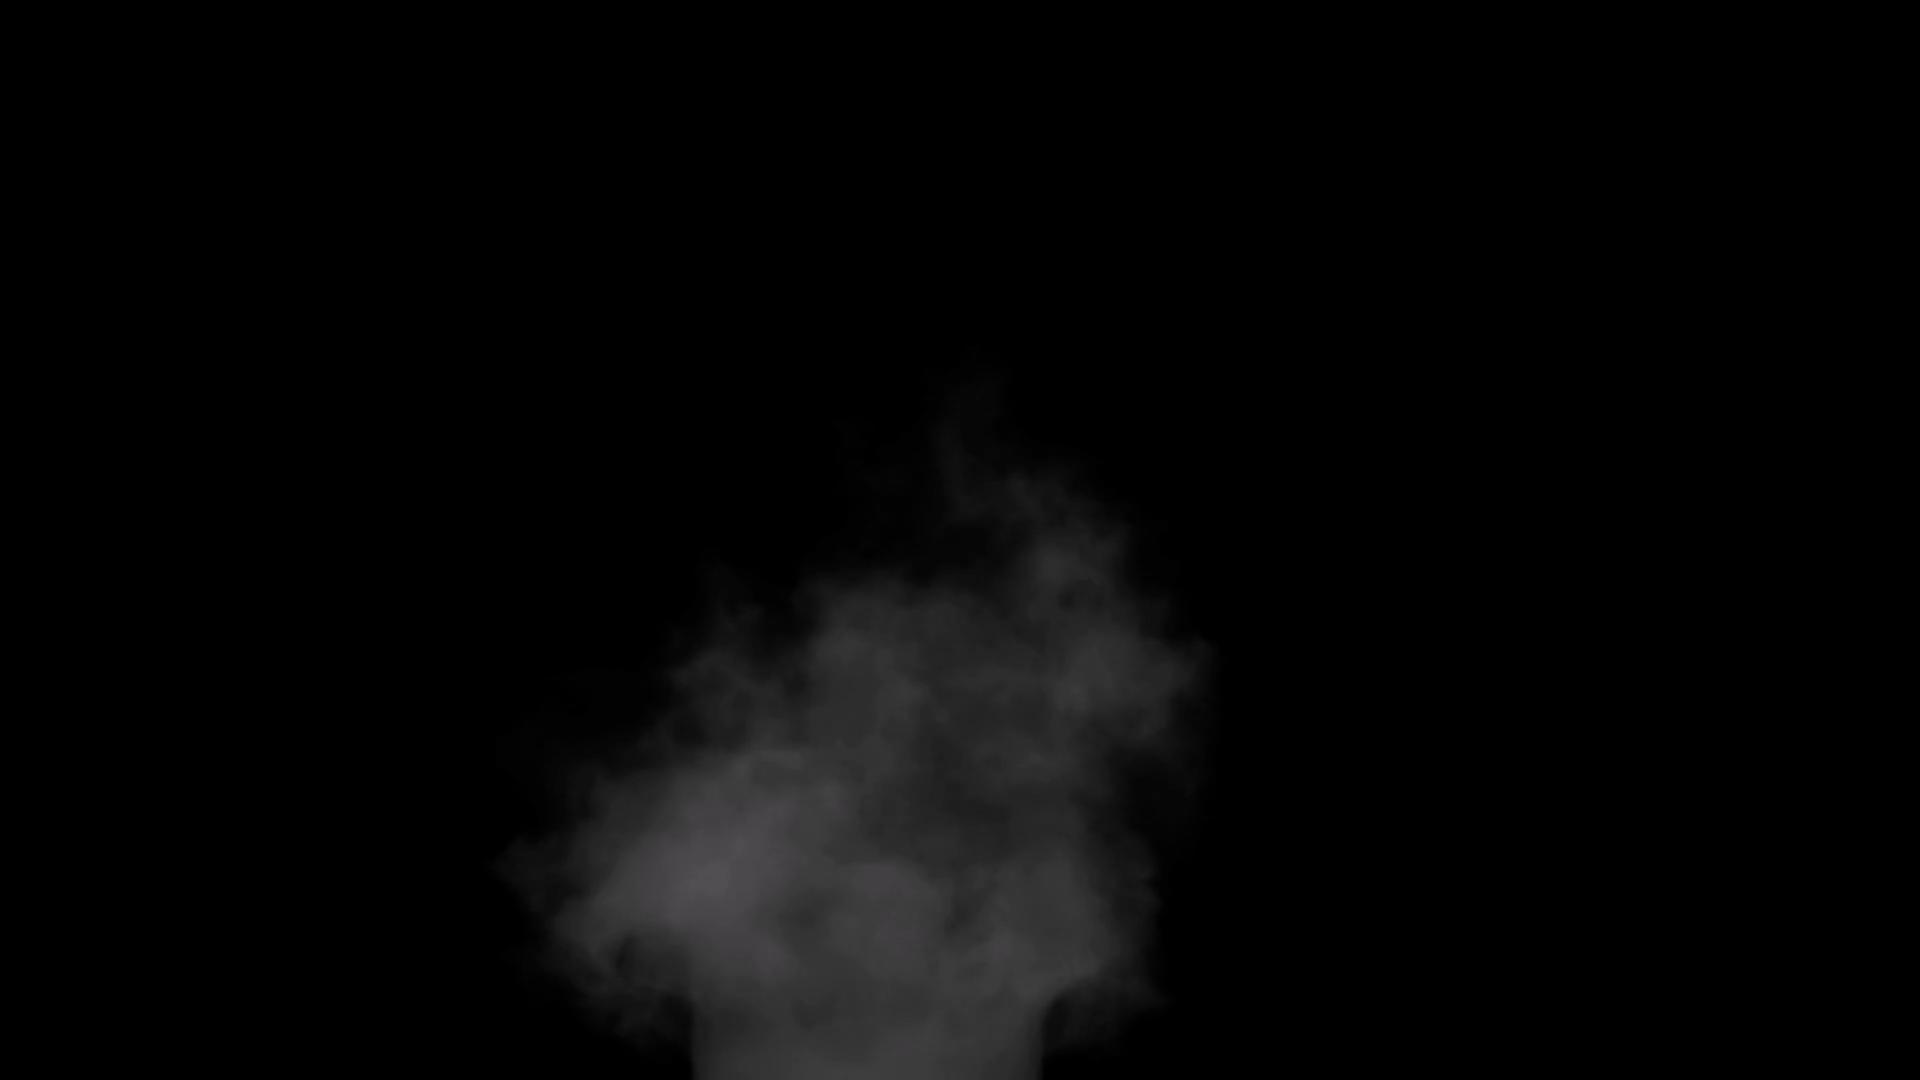 Design Elements Chimney Like Smoke Effect 6 Stock Video Footage.